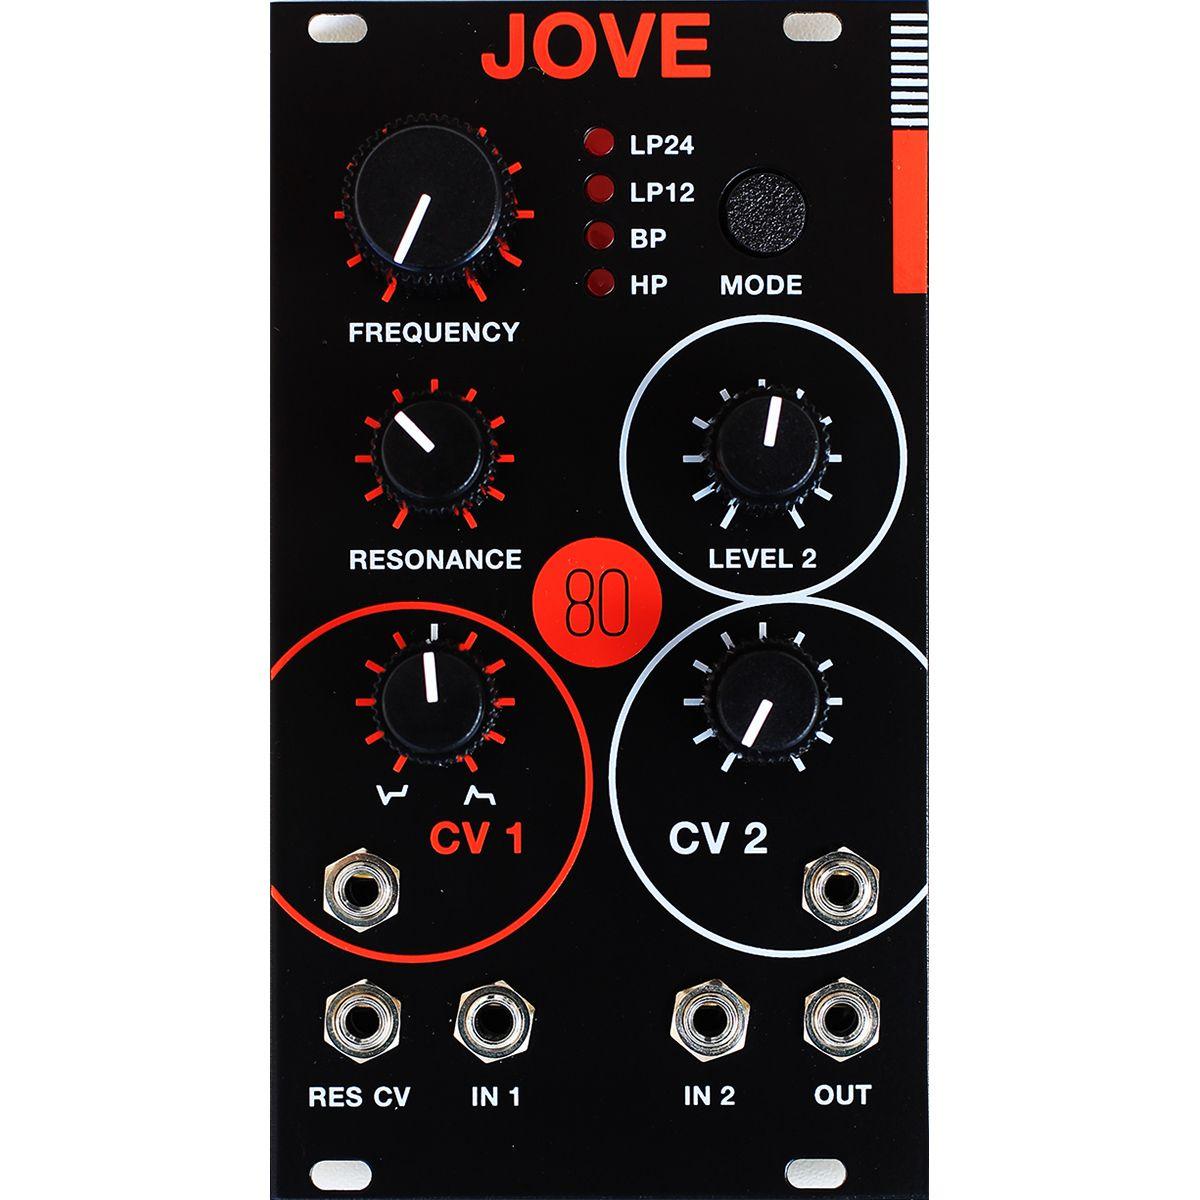 System80 JOVE Eurorack Filter Module (Jupiter 6) - LTD EDITION